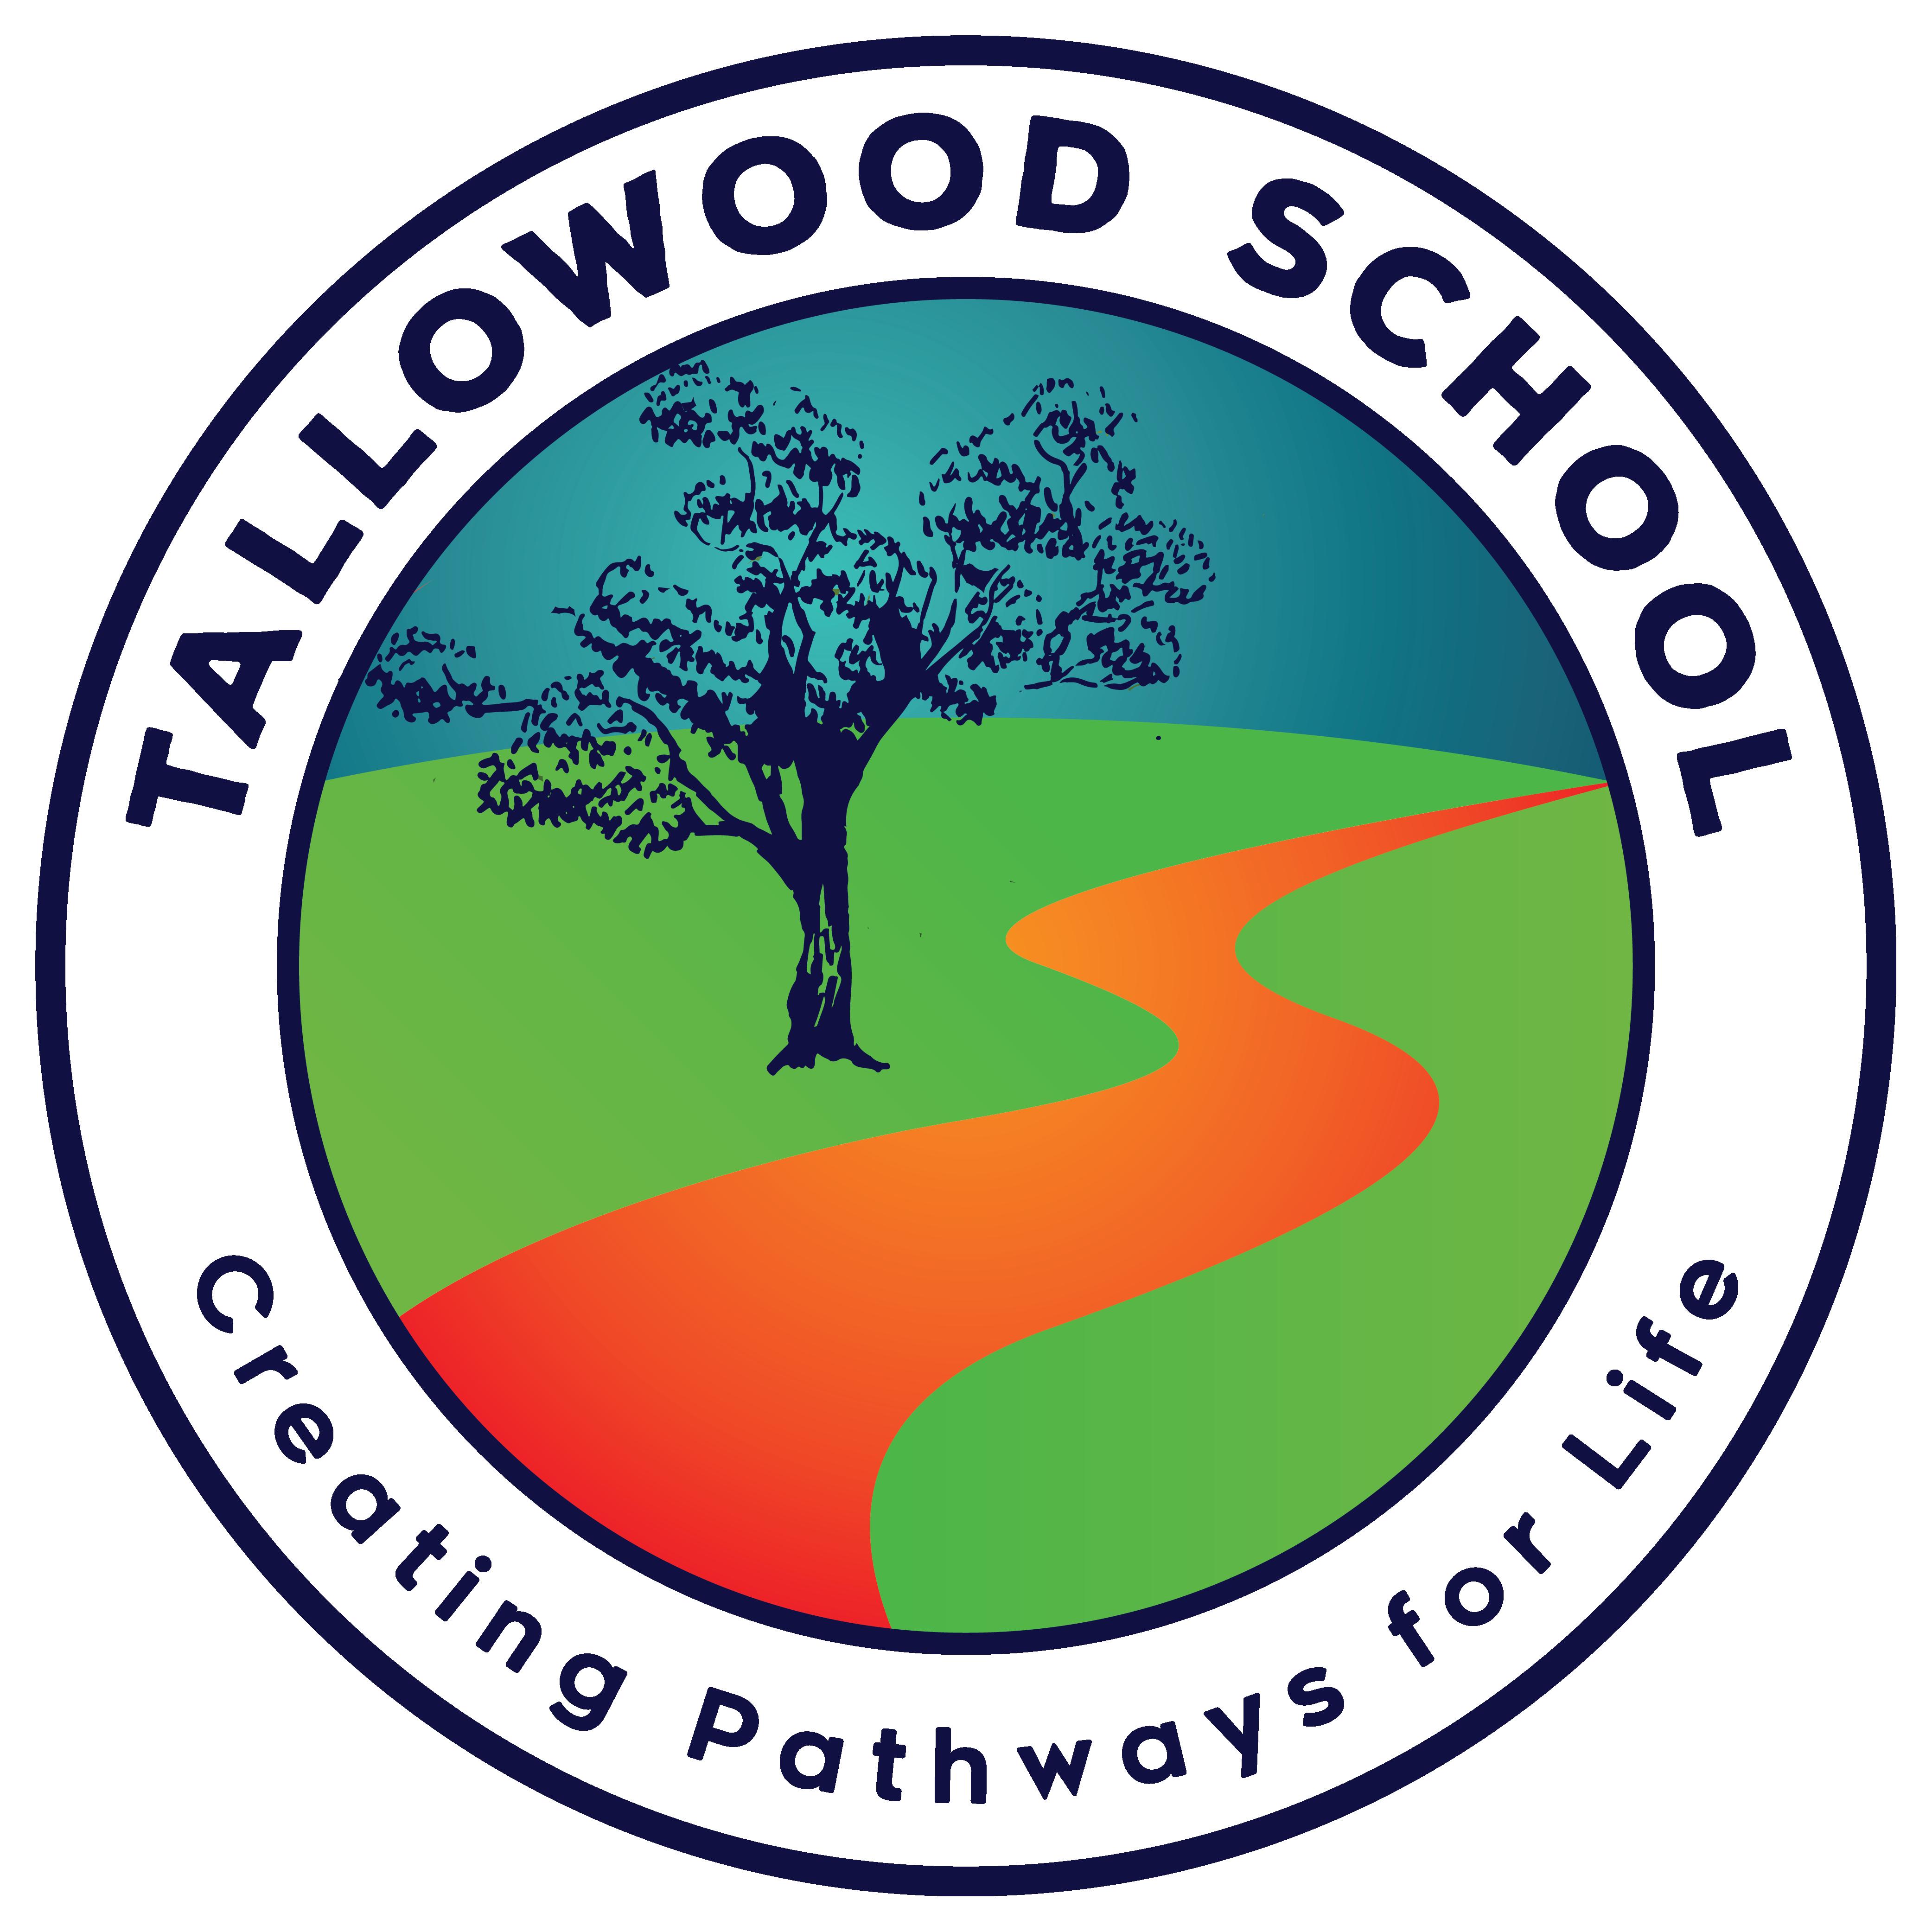 Tallowood School logo